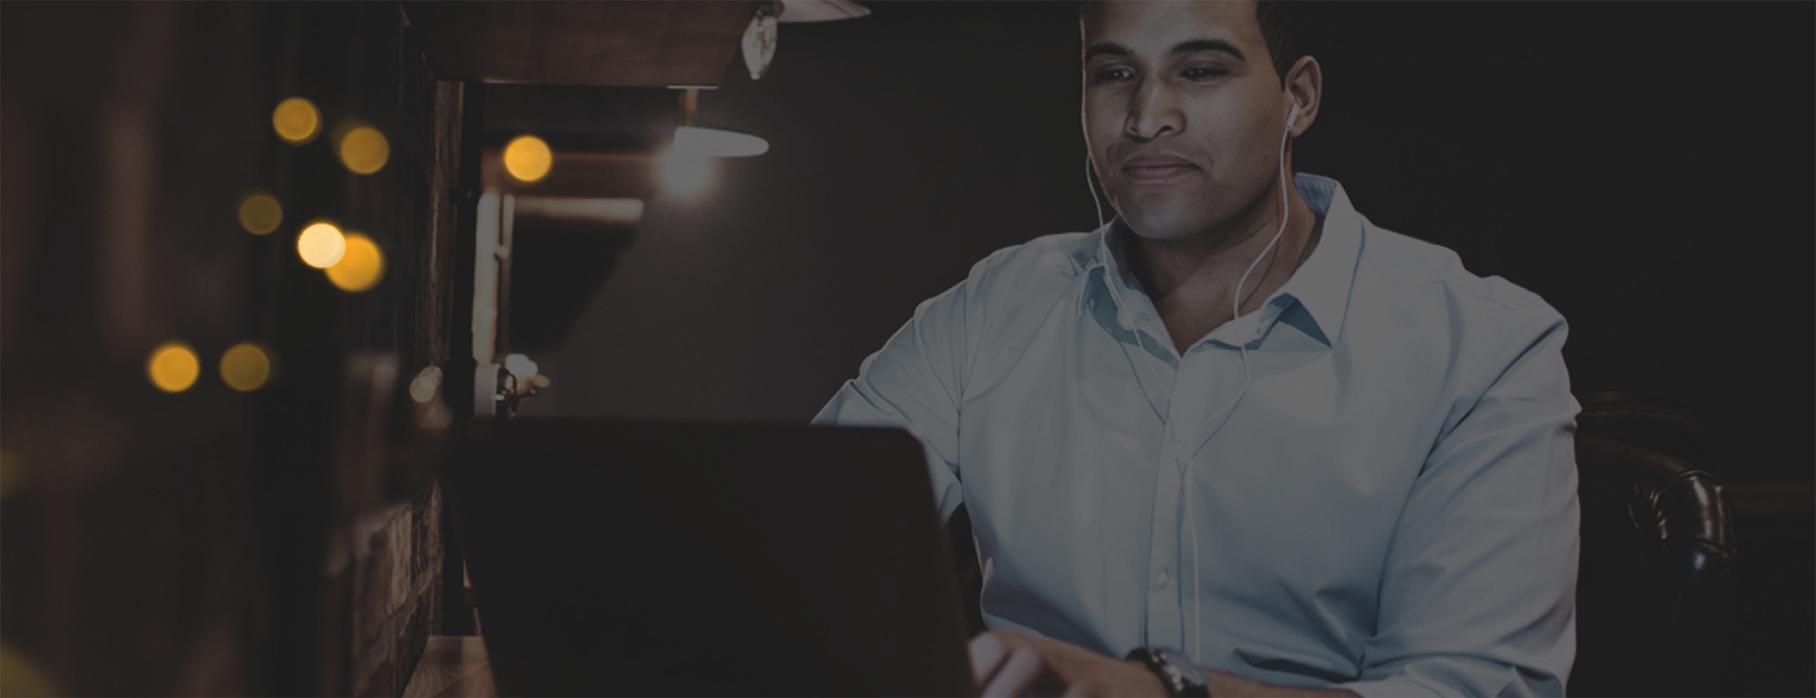 Application Performance Monitoring webinar